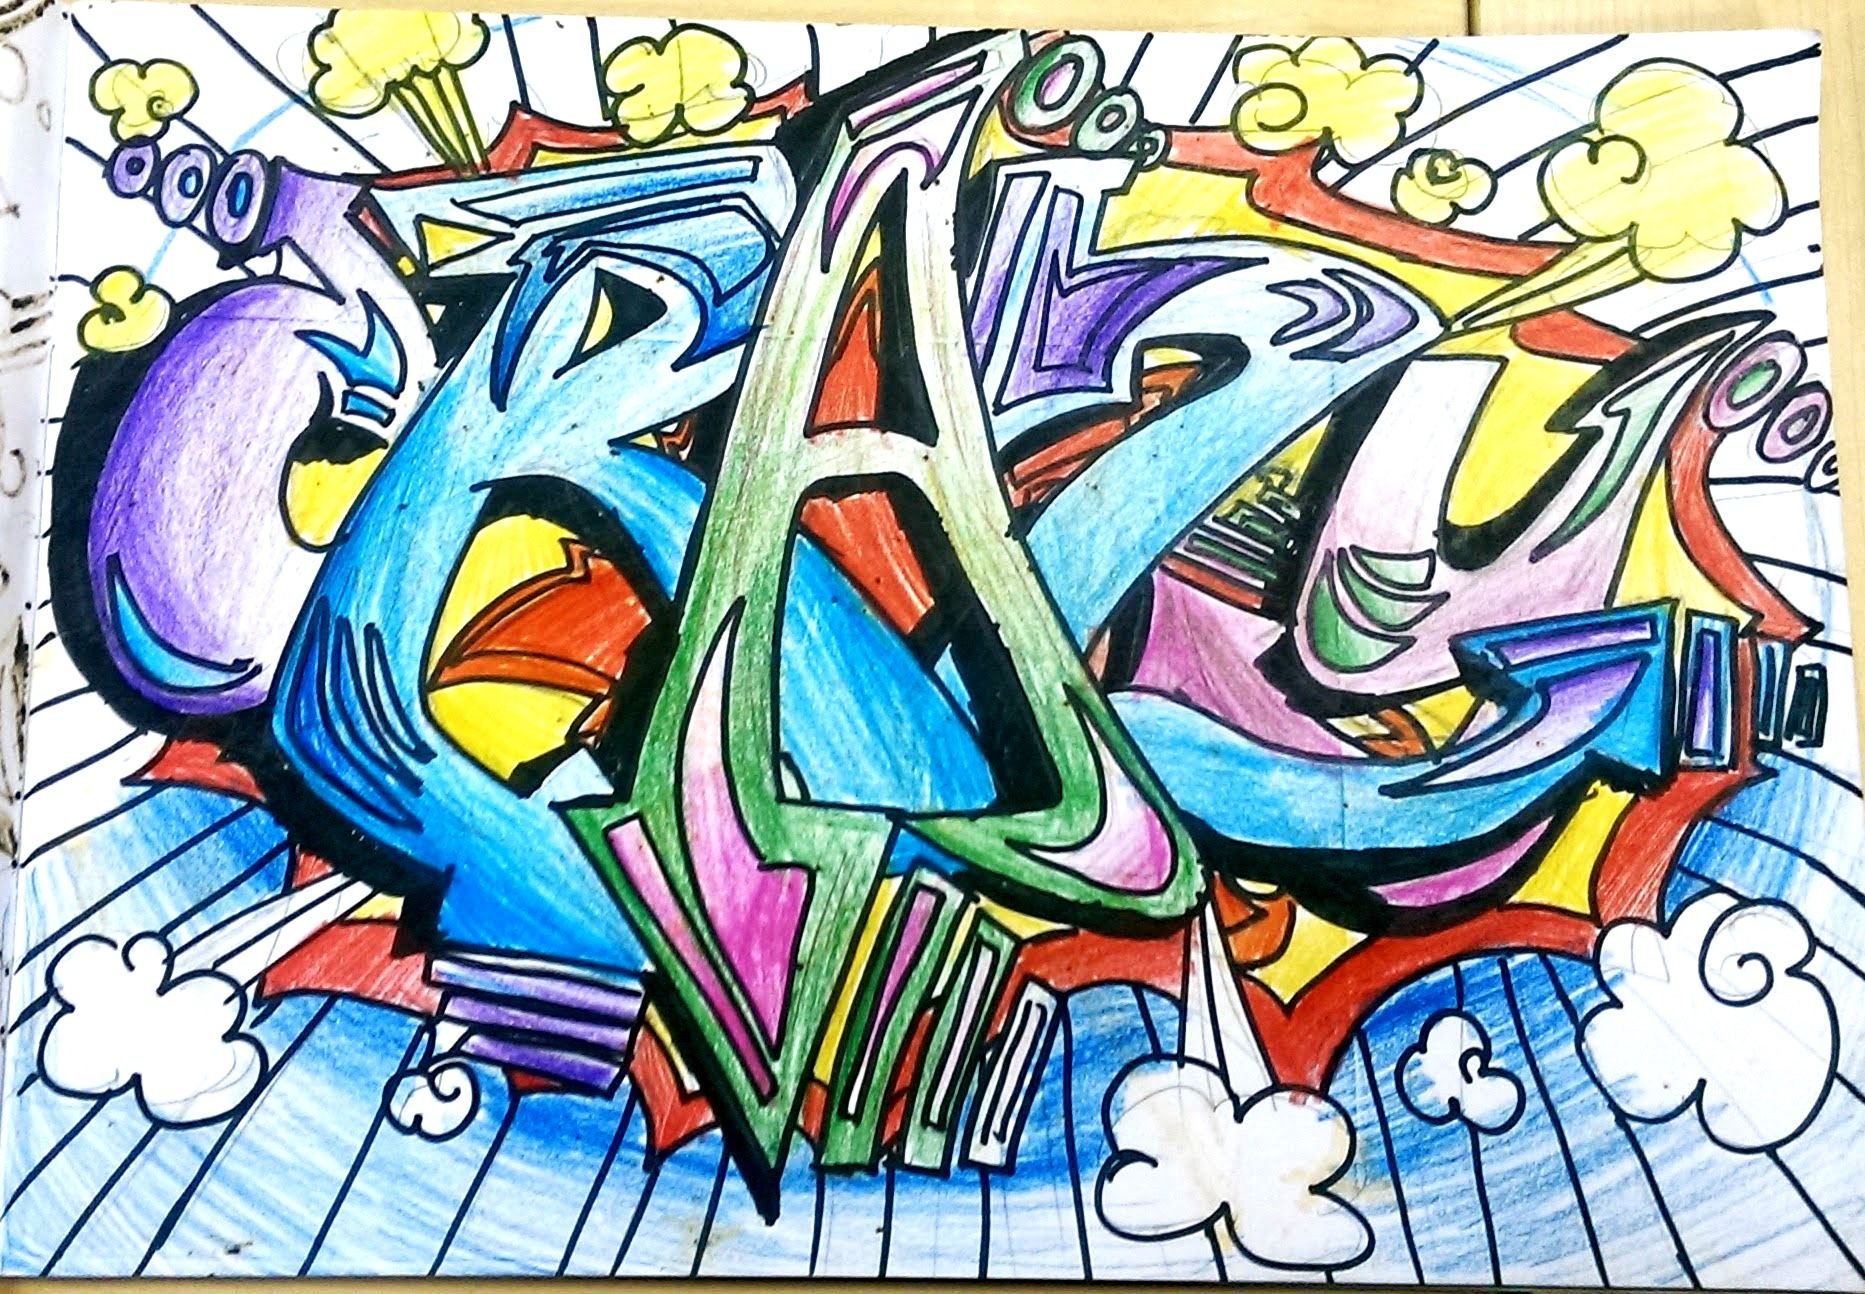 Year Graffiti Project Year Art Ideas Pinterest Graffiti - Amazing graffiti alters perspective space